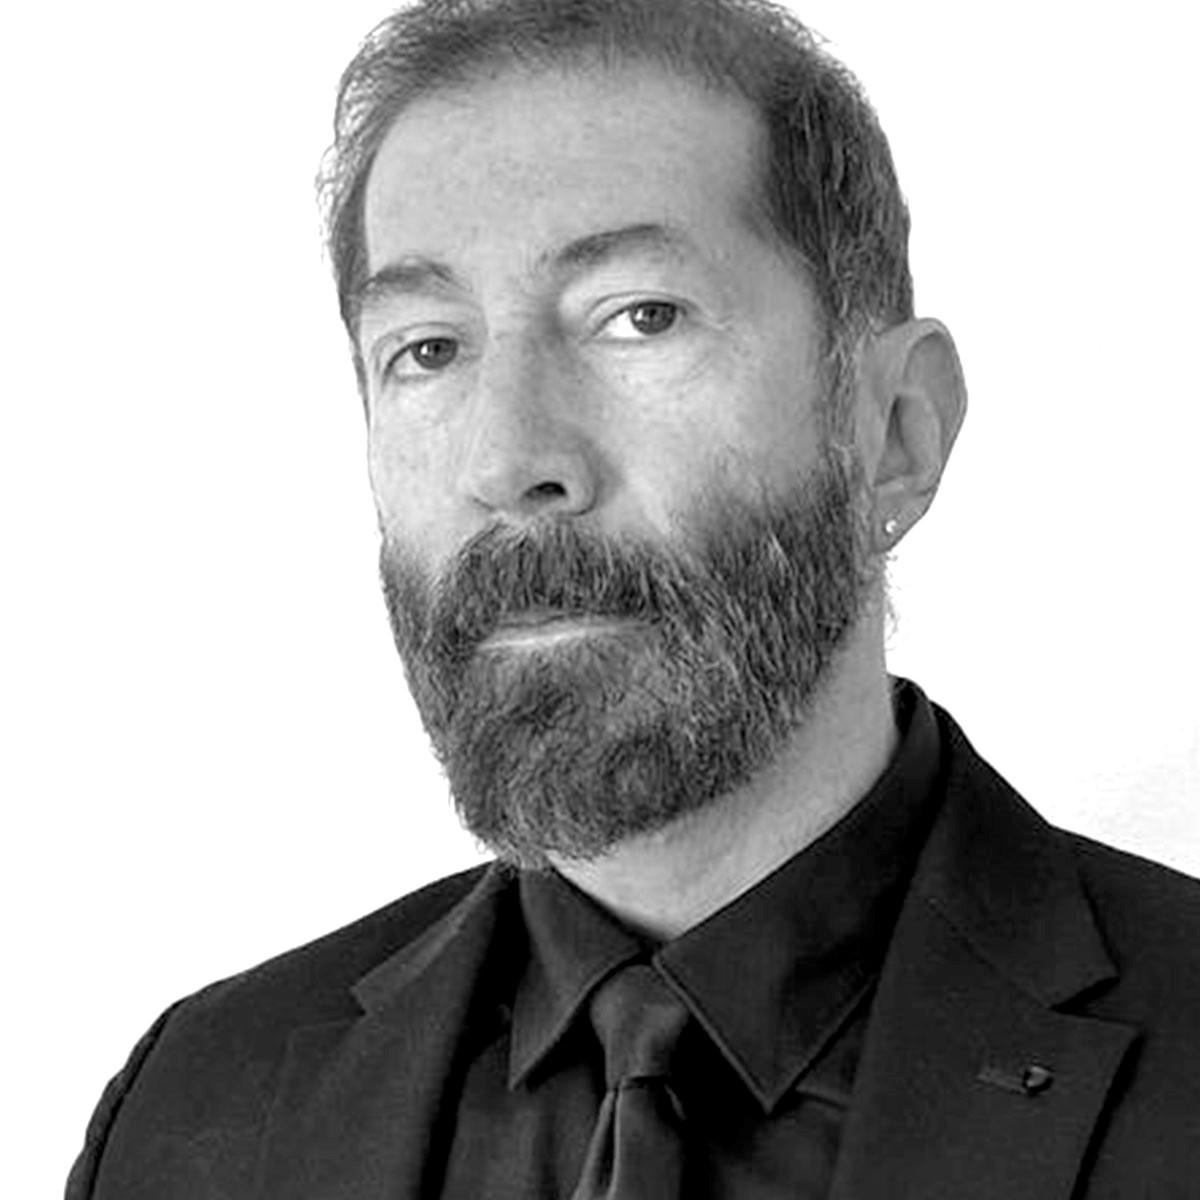 Psicoanalista Mexicano gana The Sigourney Award-2020  por logros en psicoanálisis